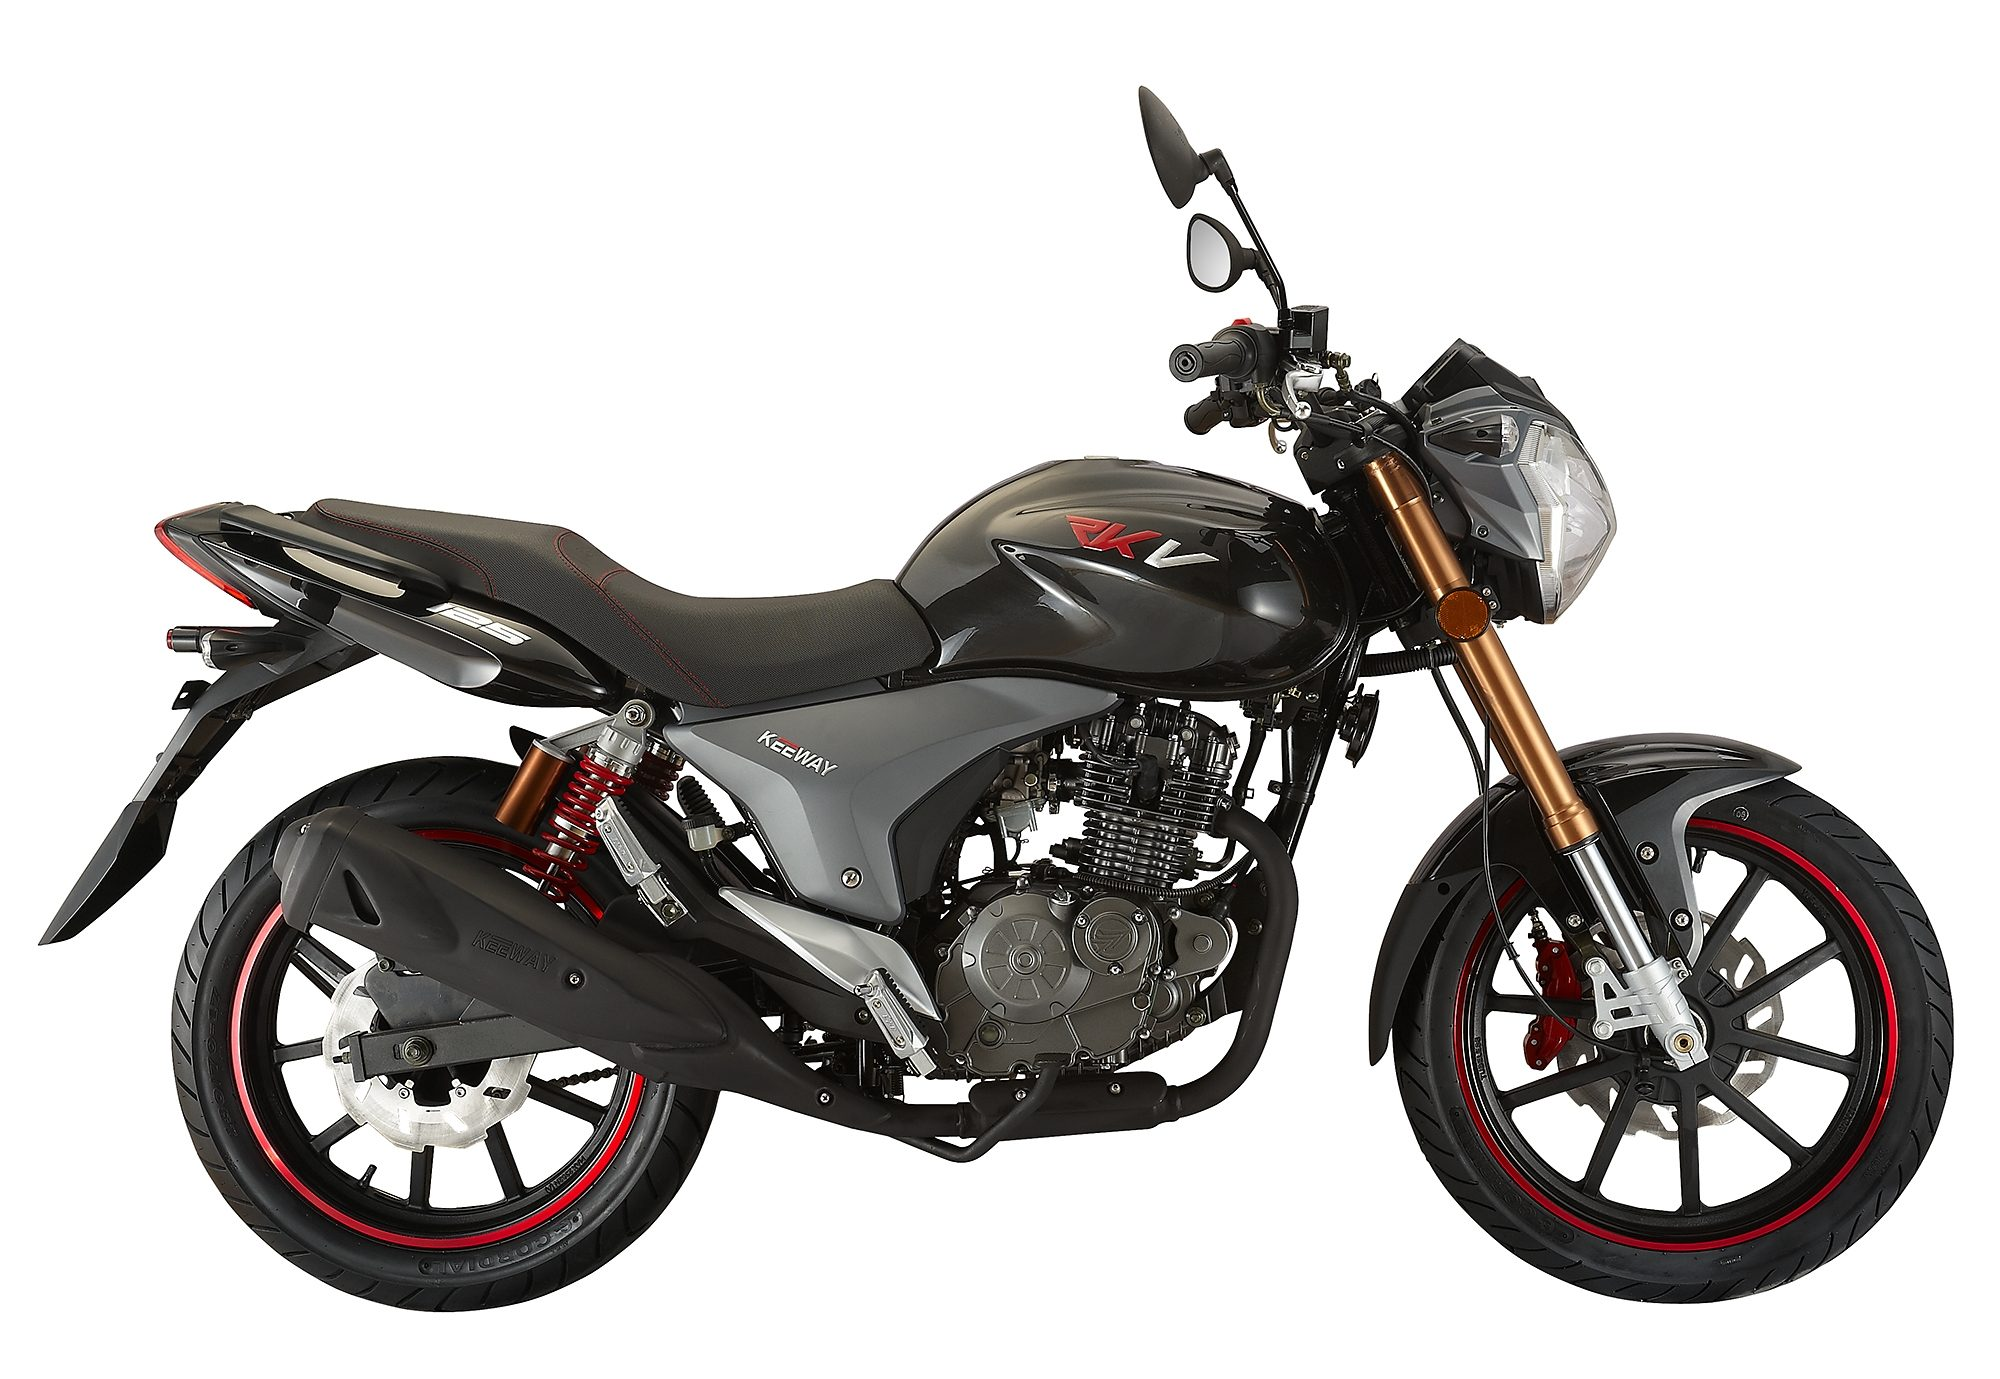 Motorrad, 95 km/h, 124,5 ccm, 11,15 PS, schwarz , »RKV 125 Naked«, Keeway